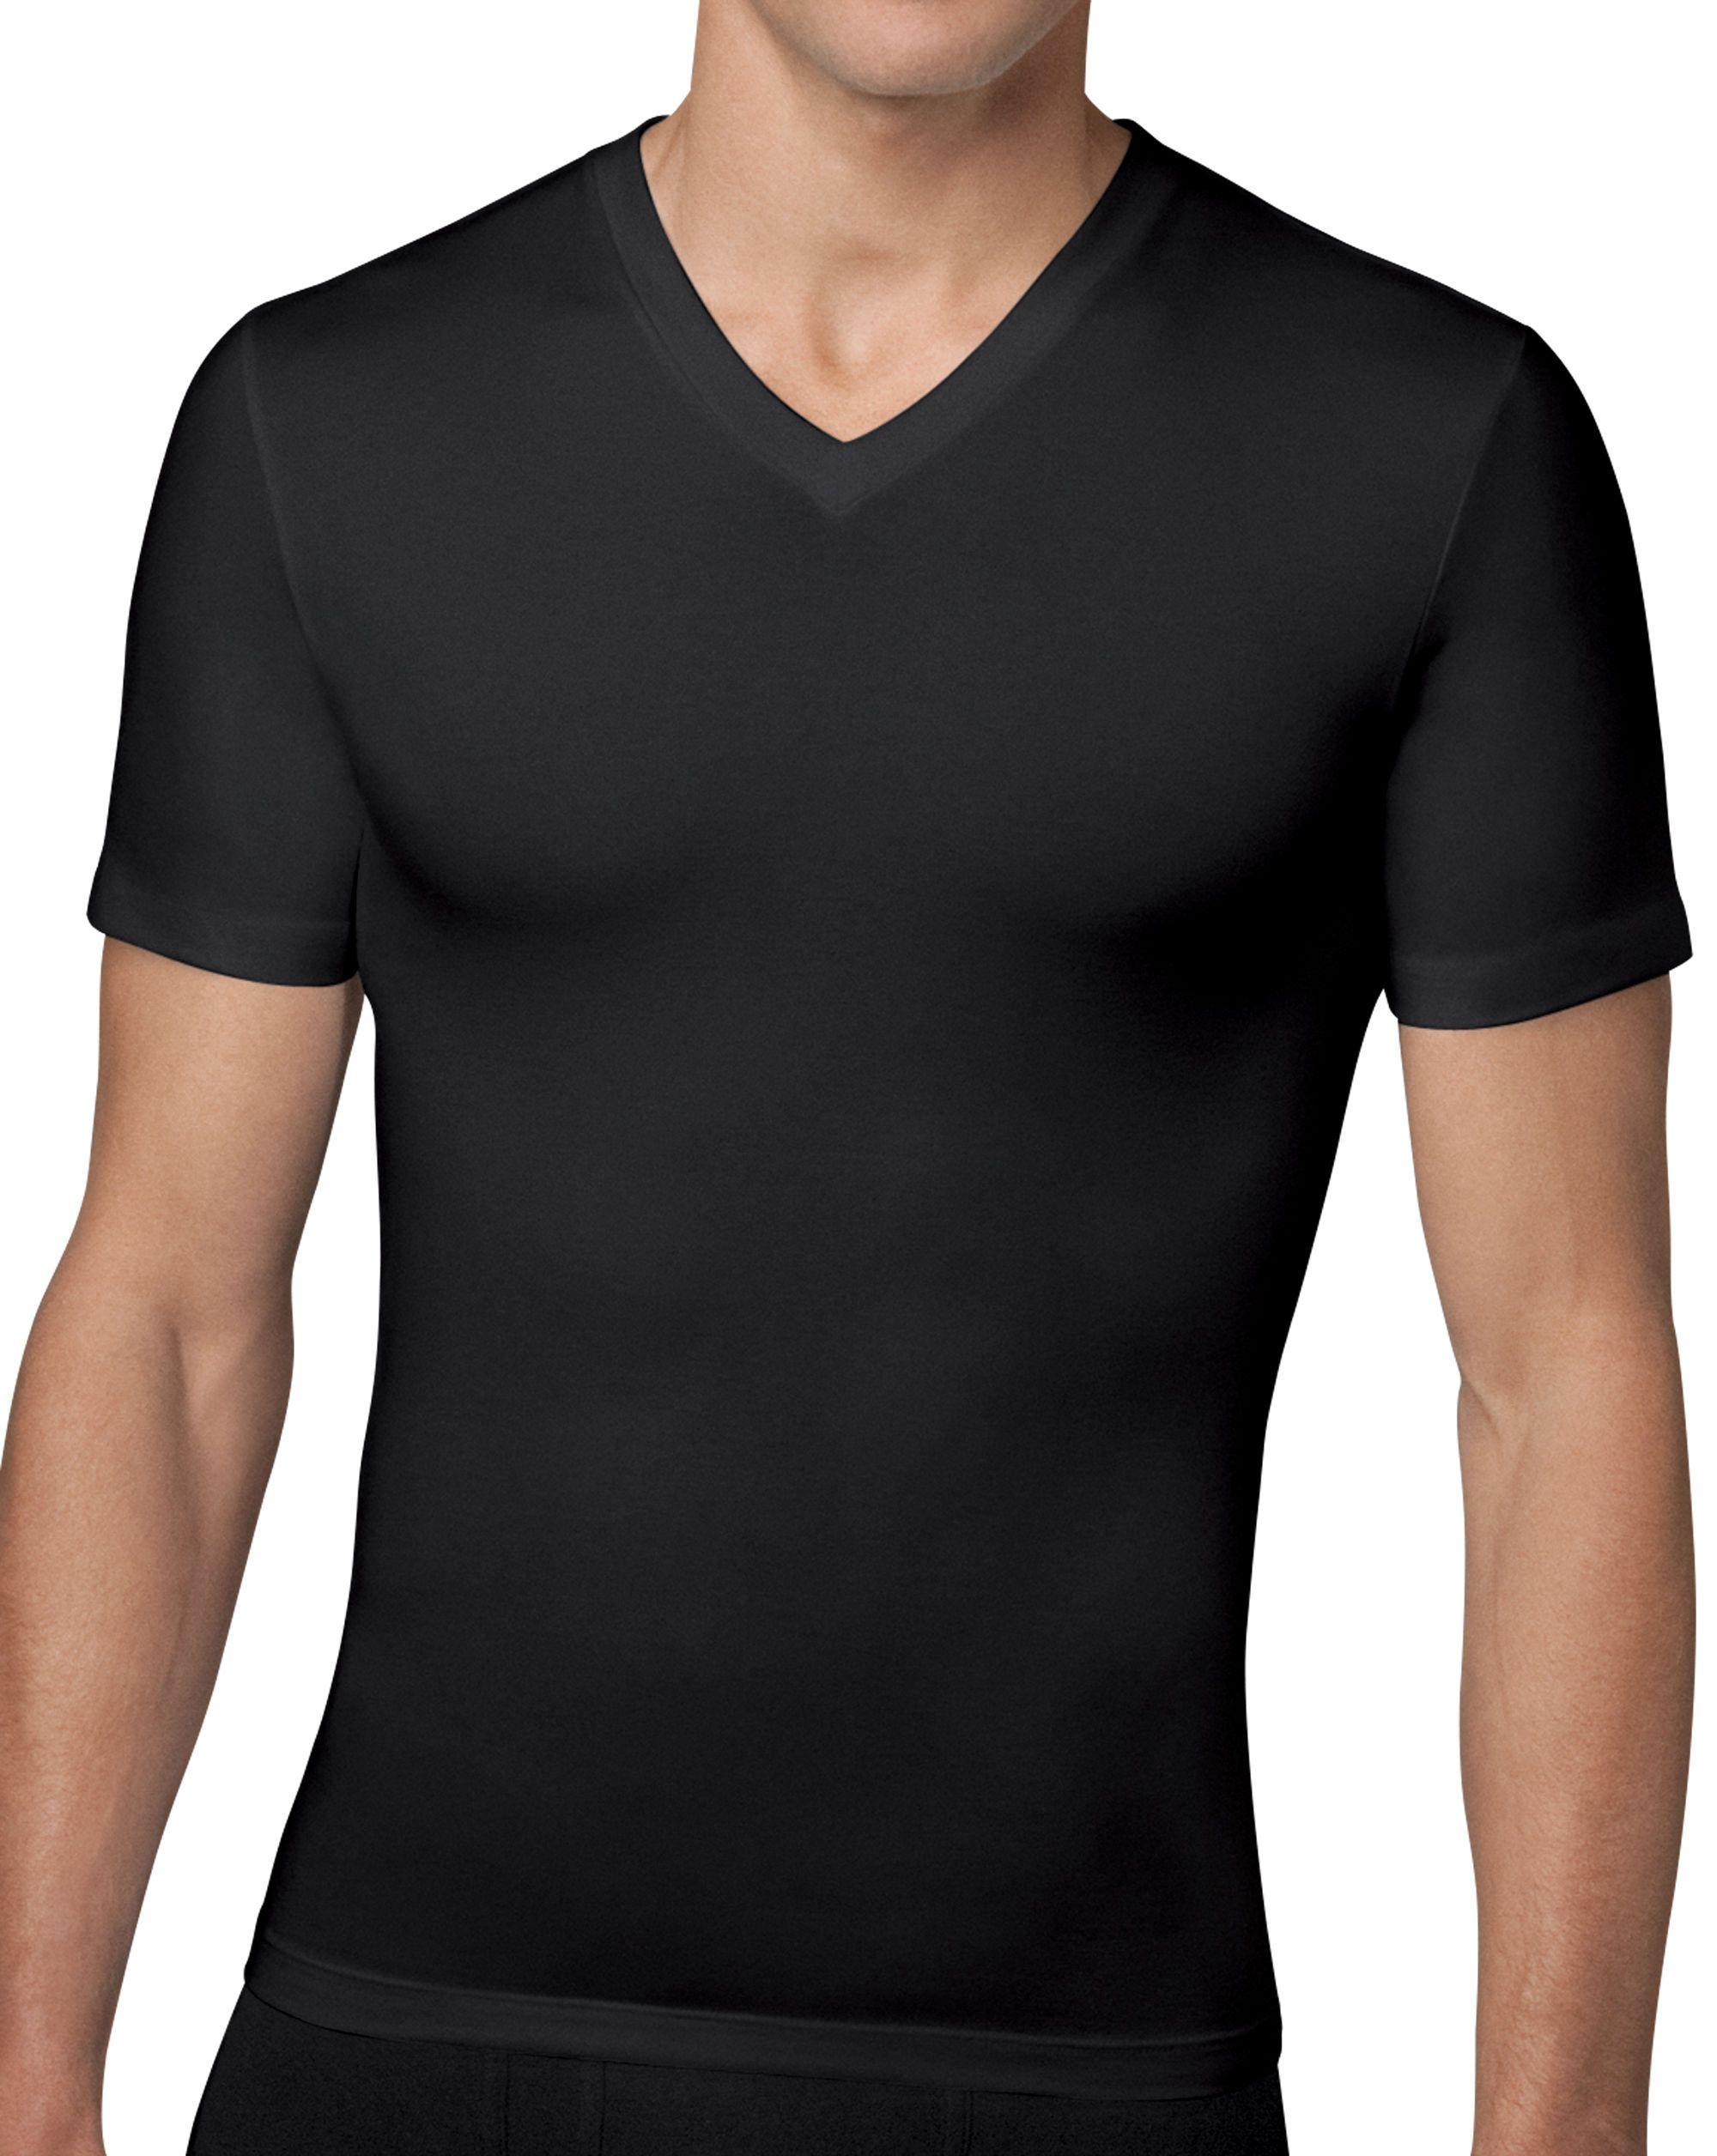 Cotton Compression V Neck Spanx V Neck Shirts